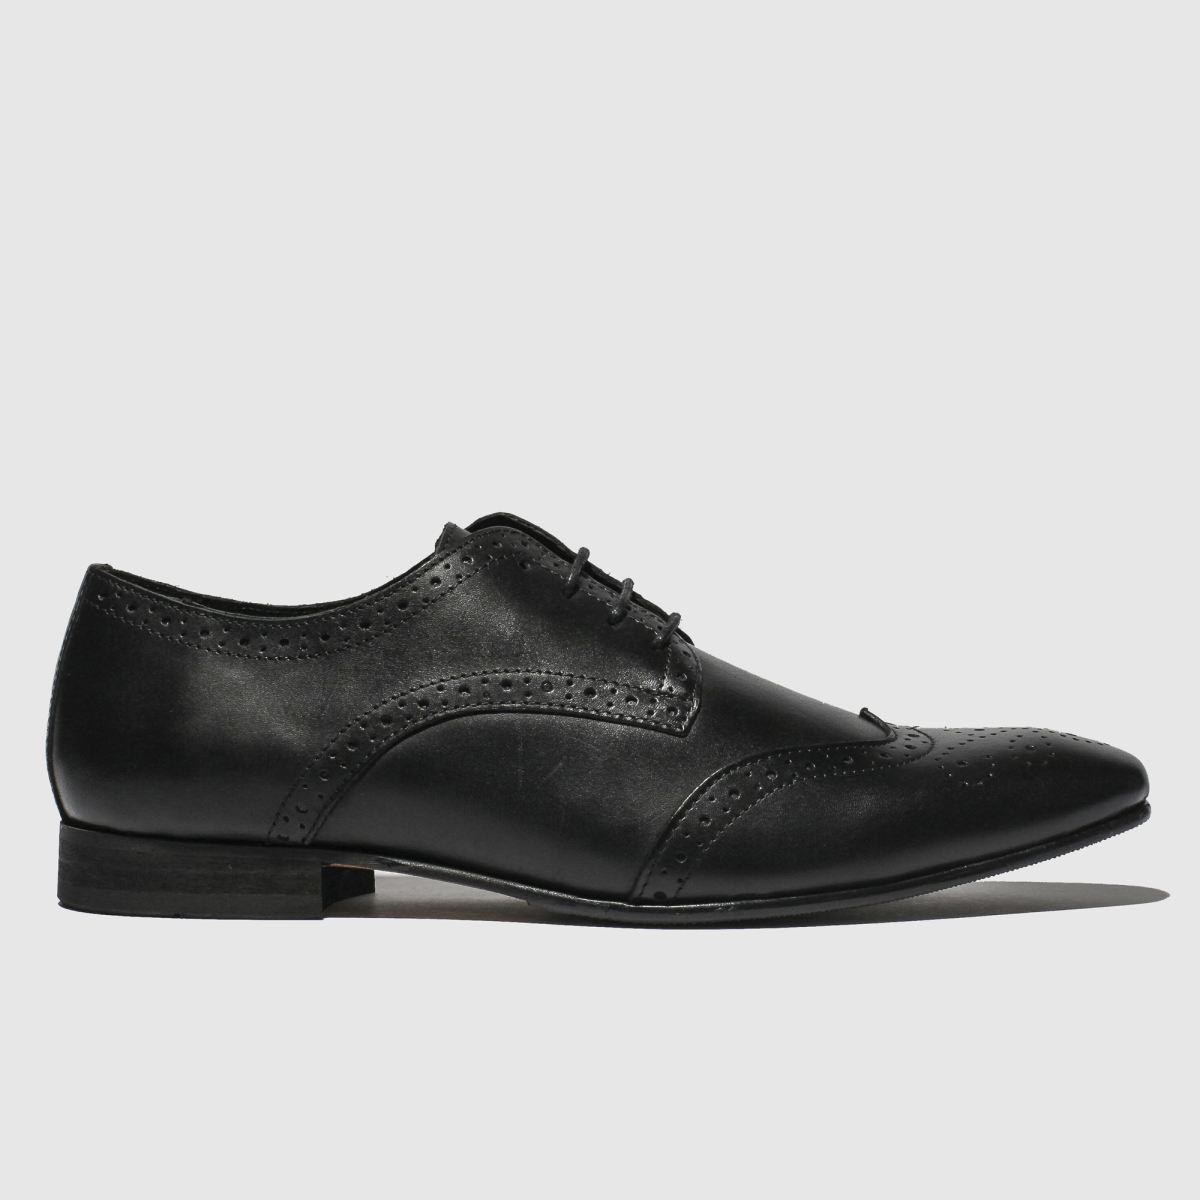 Schuh Black Robinson Brogue Shoes